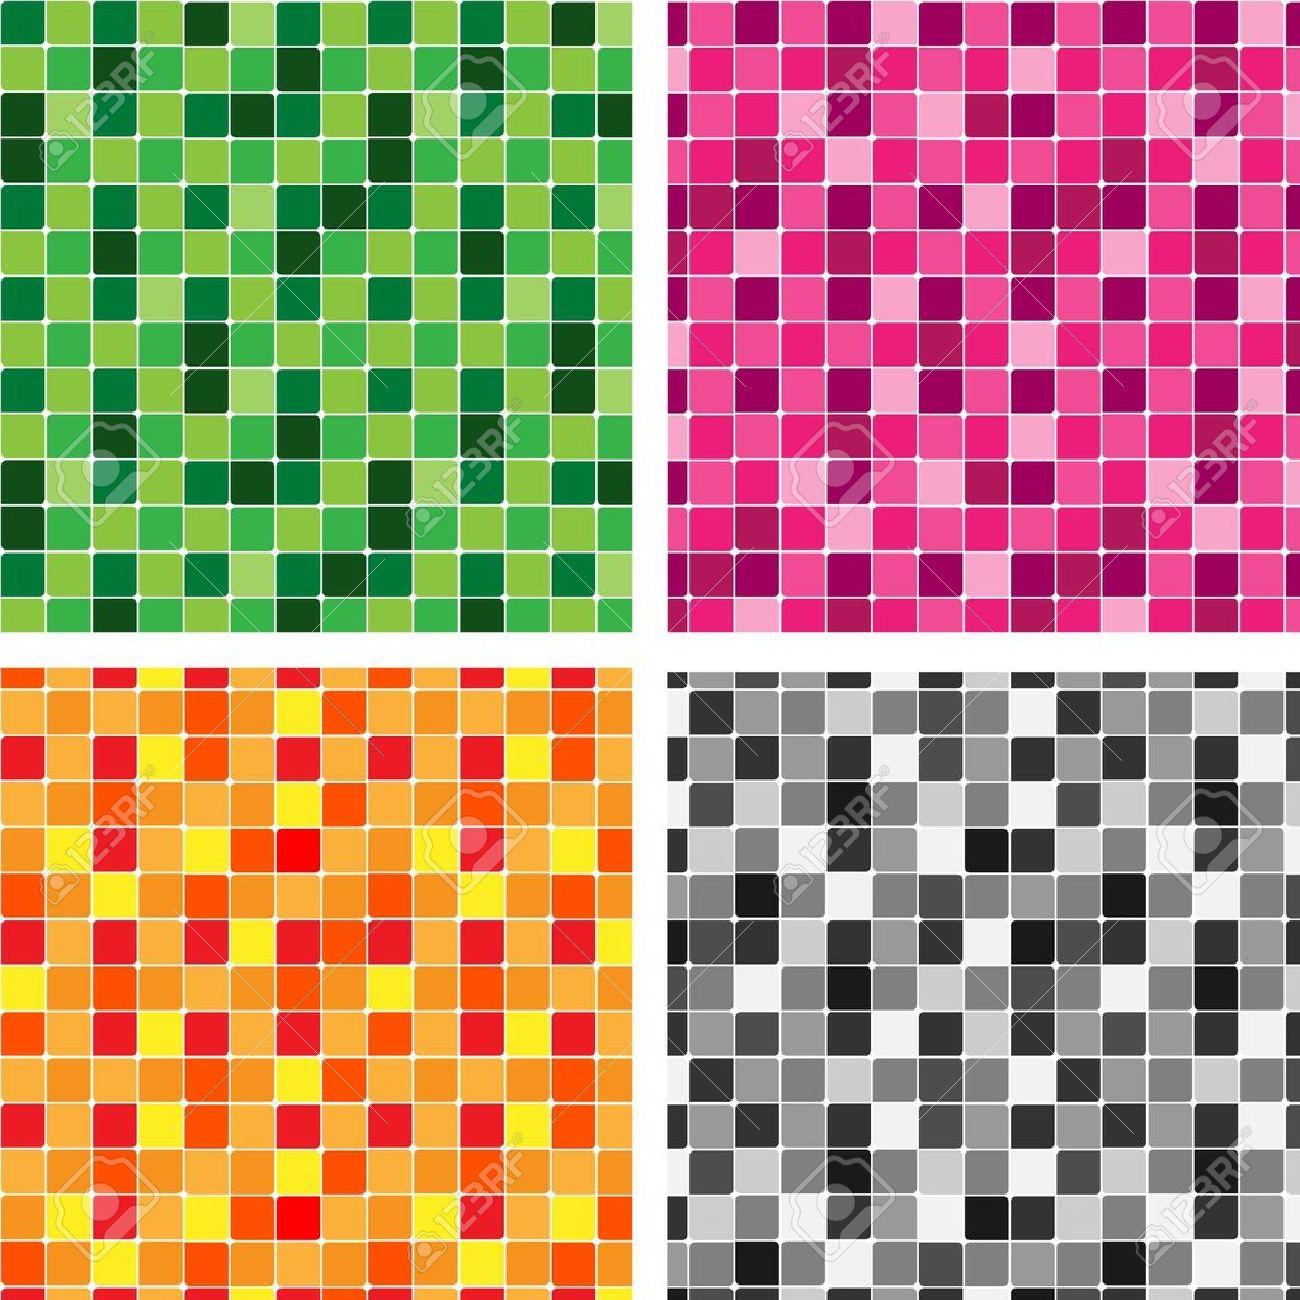 Green tiles kitchen texture - Pattern Tiles Texture Stock Vector 11327525